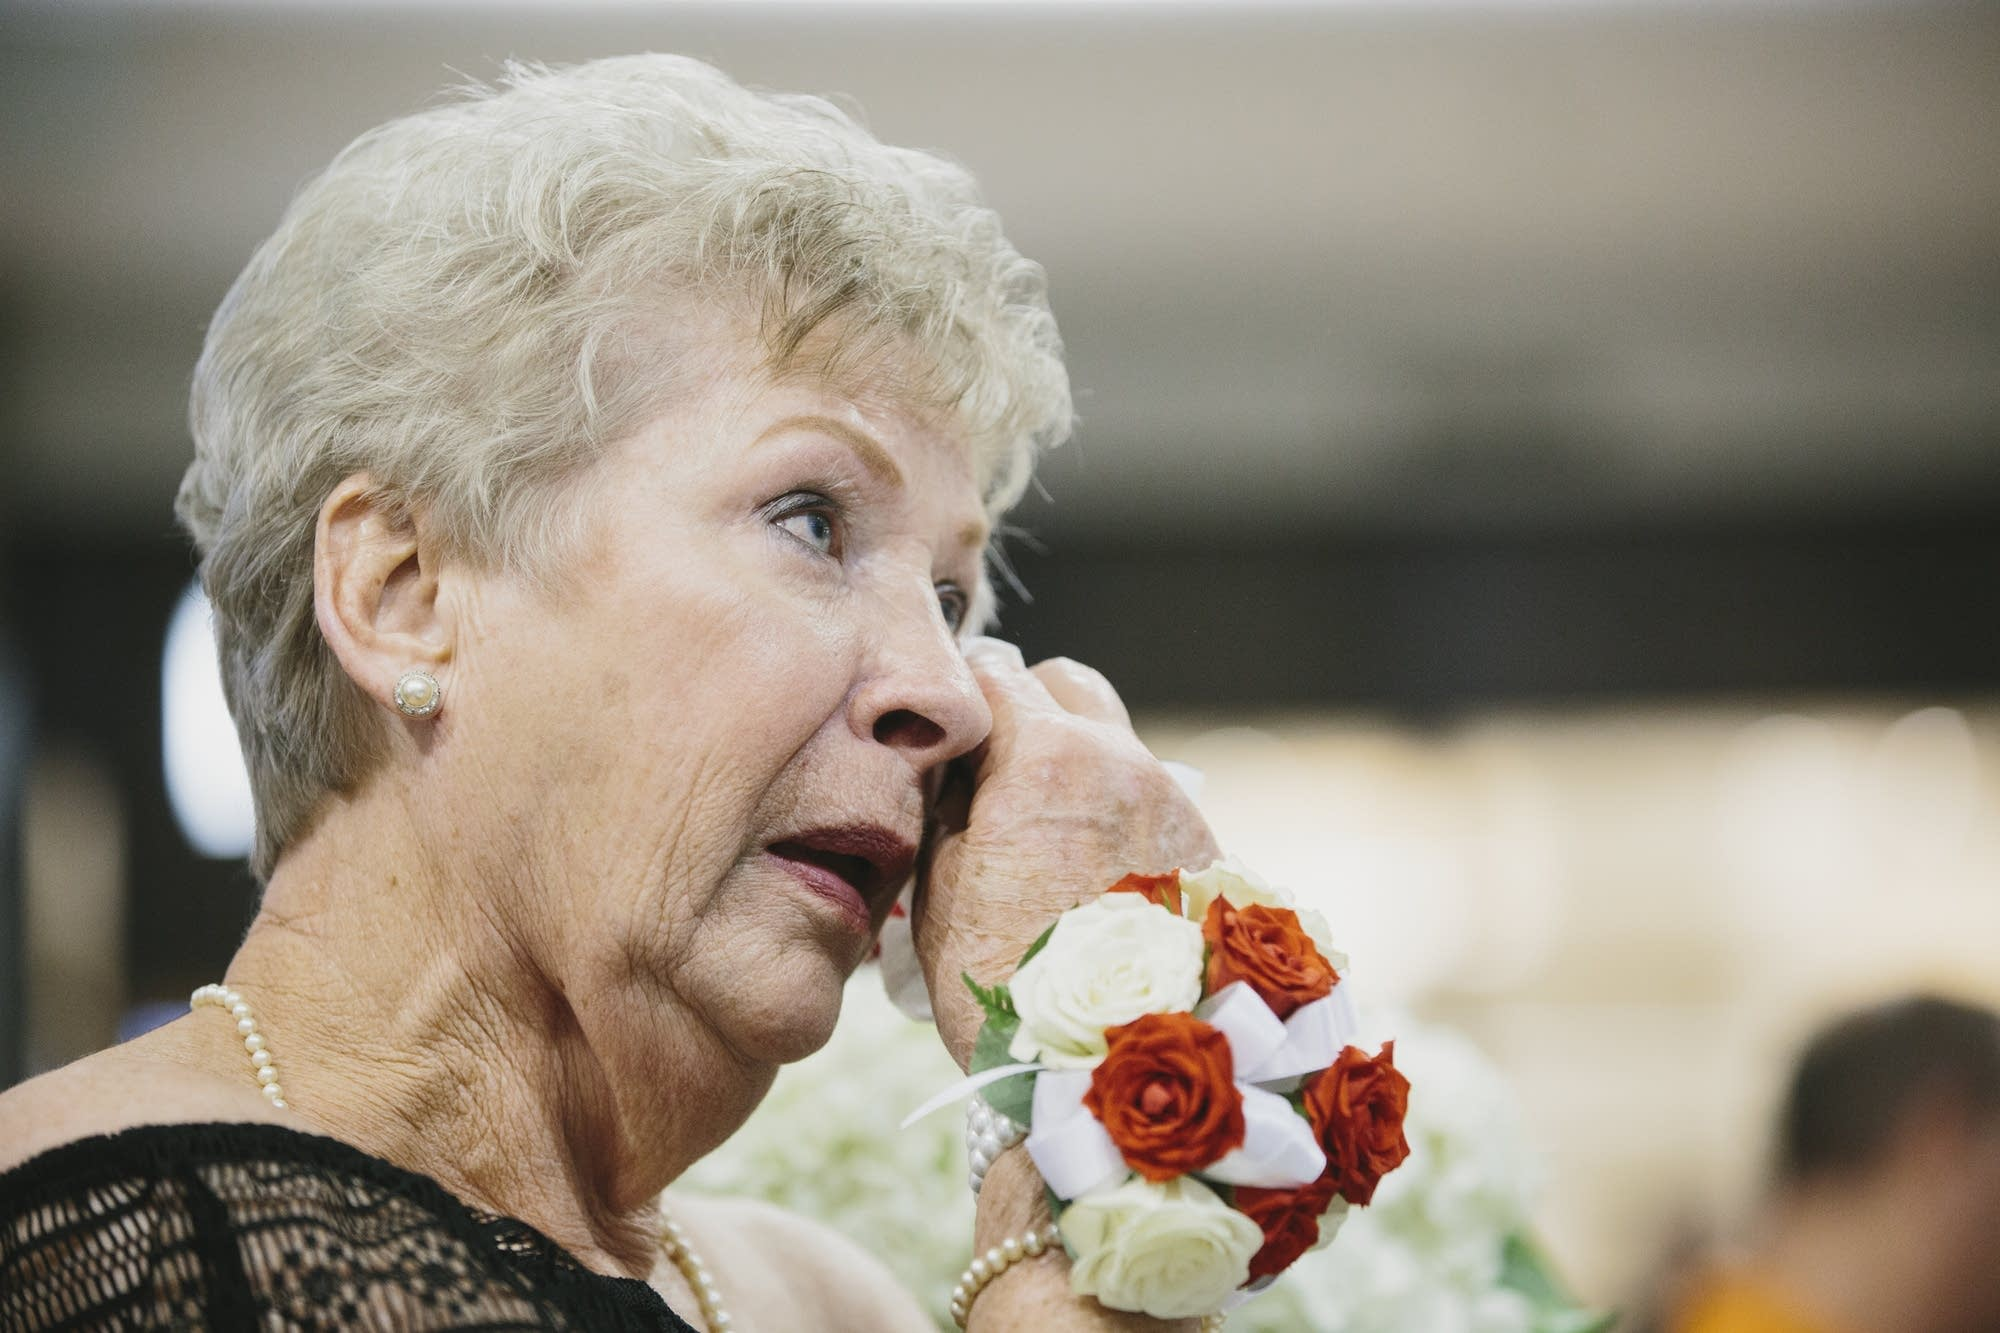 Annette Runze, mother of Elizabeth